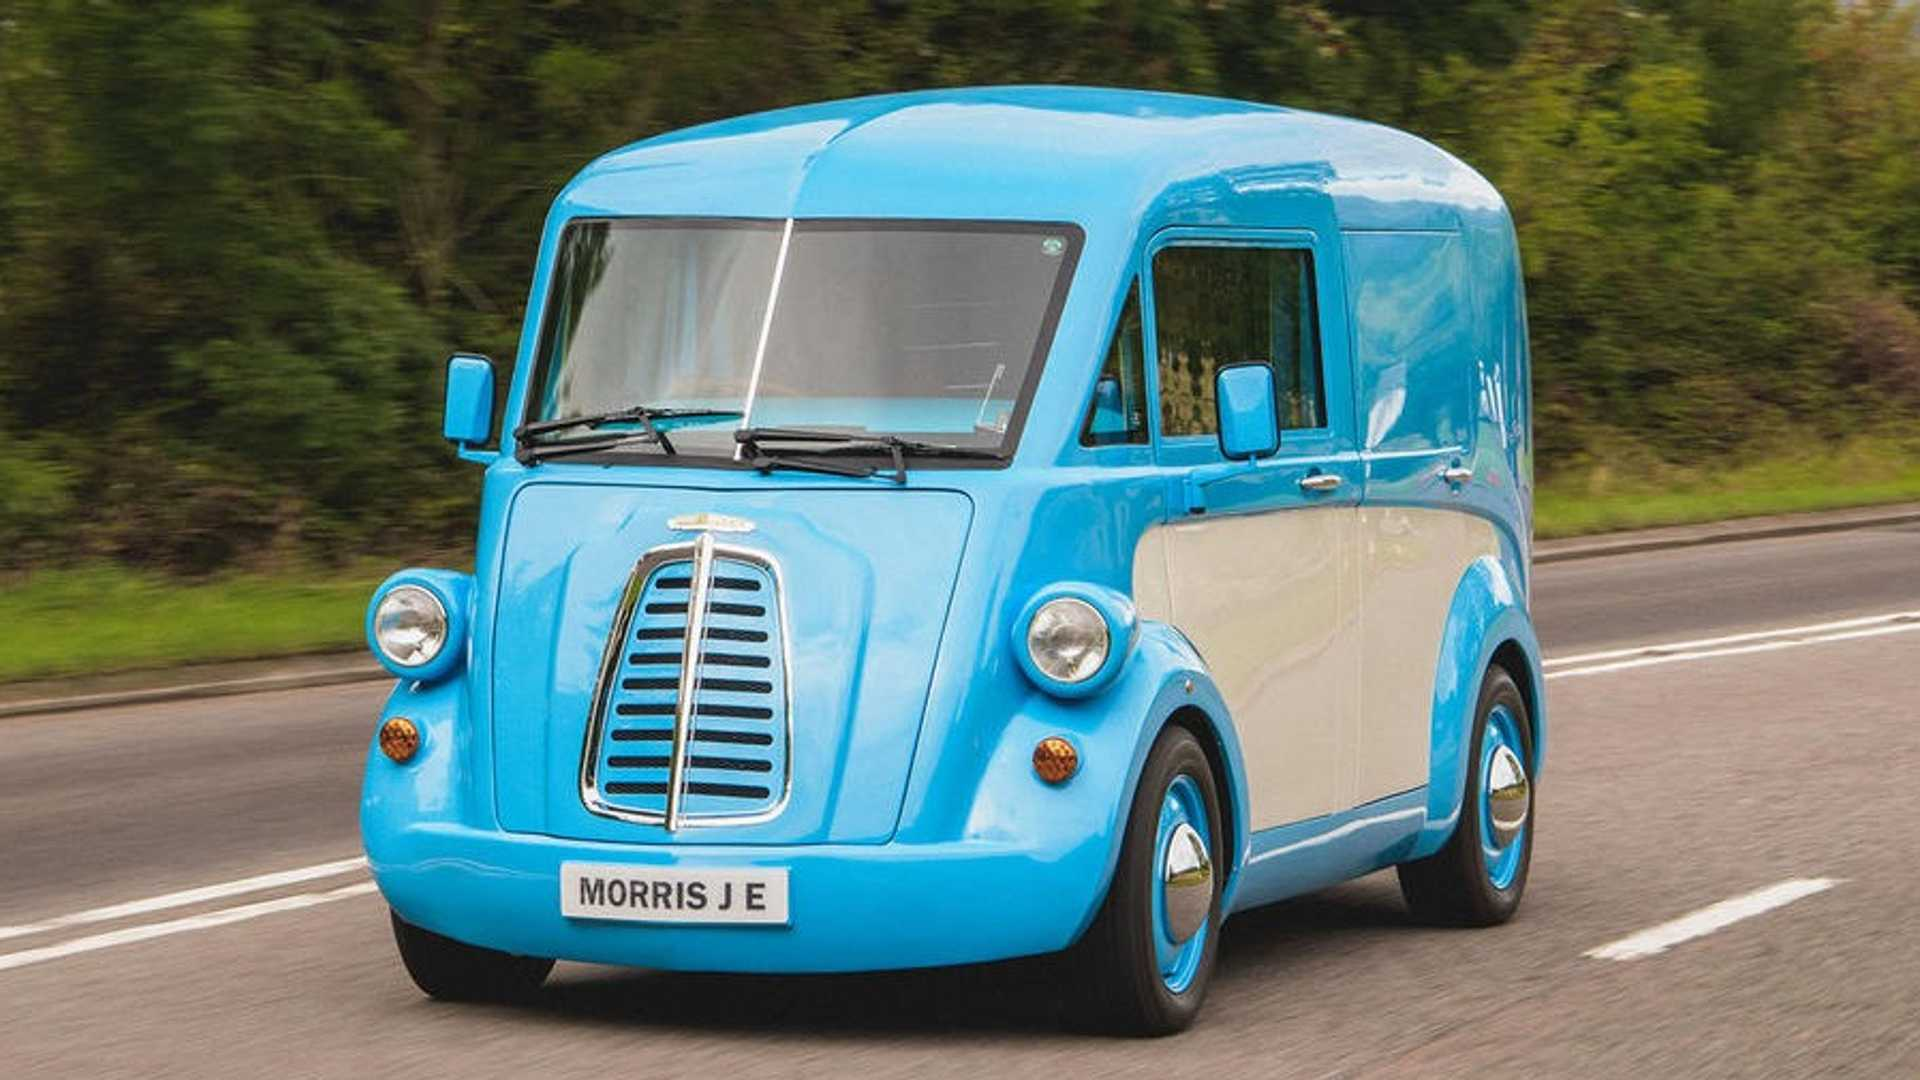 Morris Commercial JE: Elektro-Lieferwagen mit tollem Retro-Design